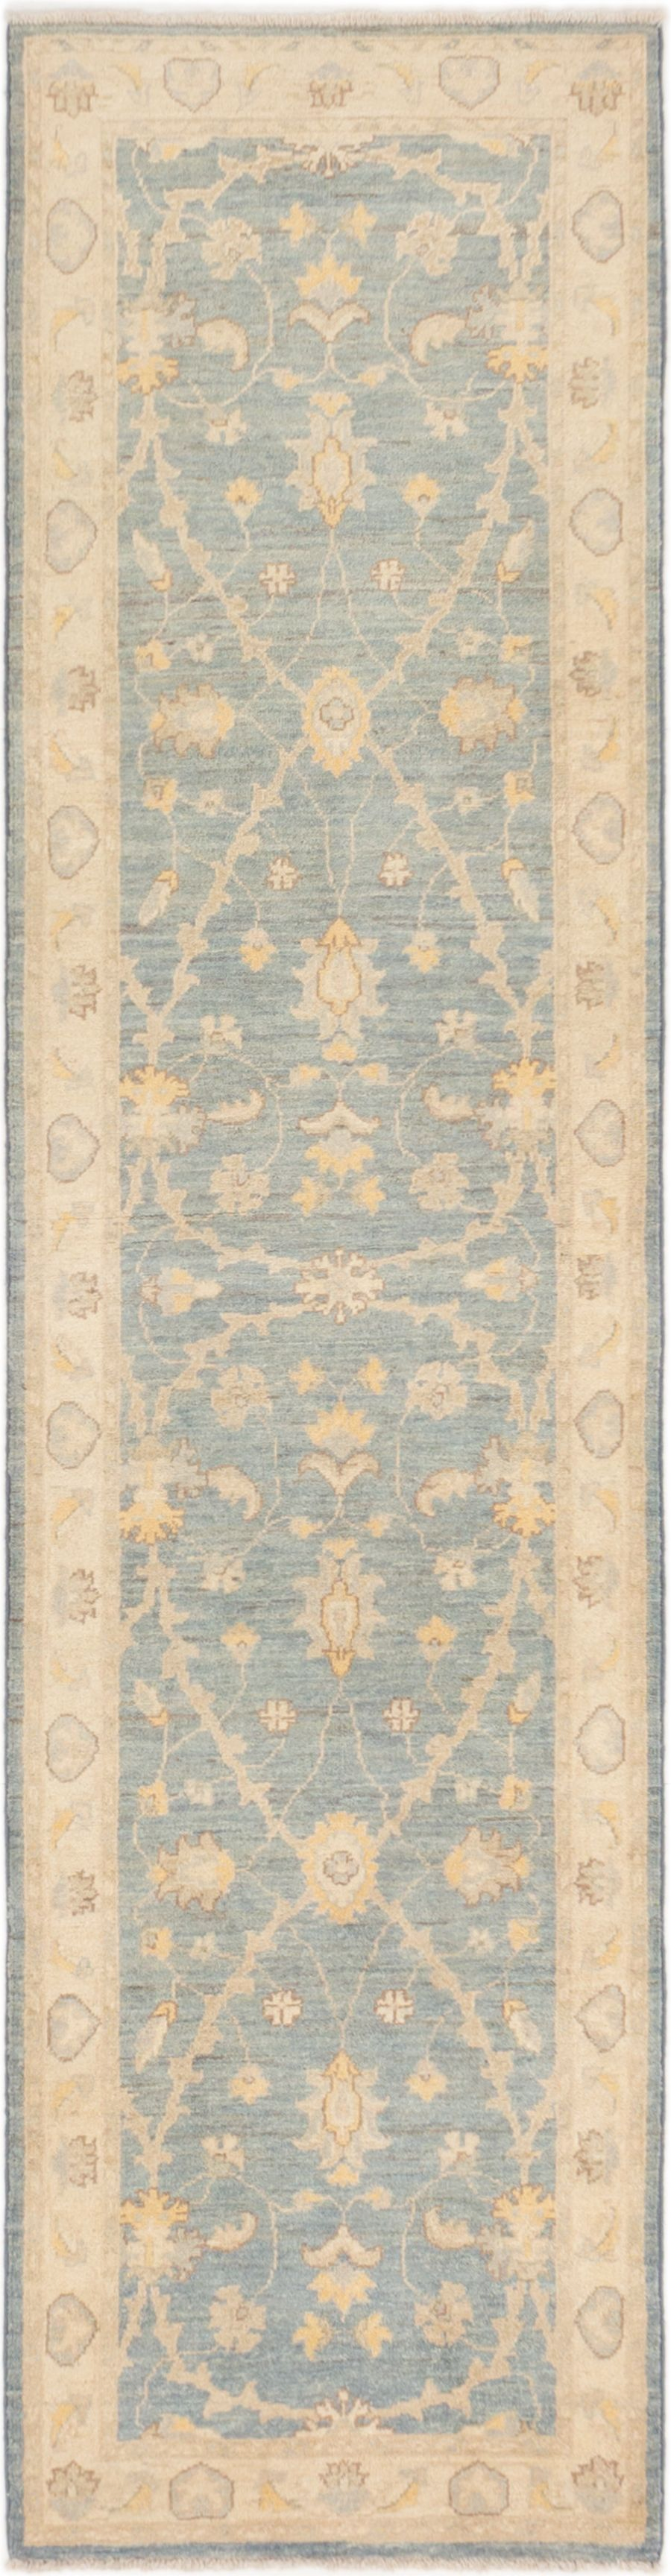 "Hand-knotted Peshawar Finest Light Denim Blue Wool Rug 2'5"" x 9'7"" Size: 2'5"" x 9'7"""